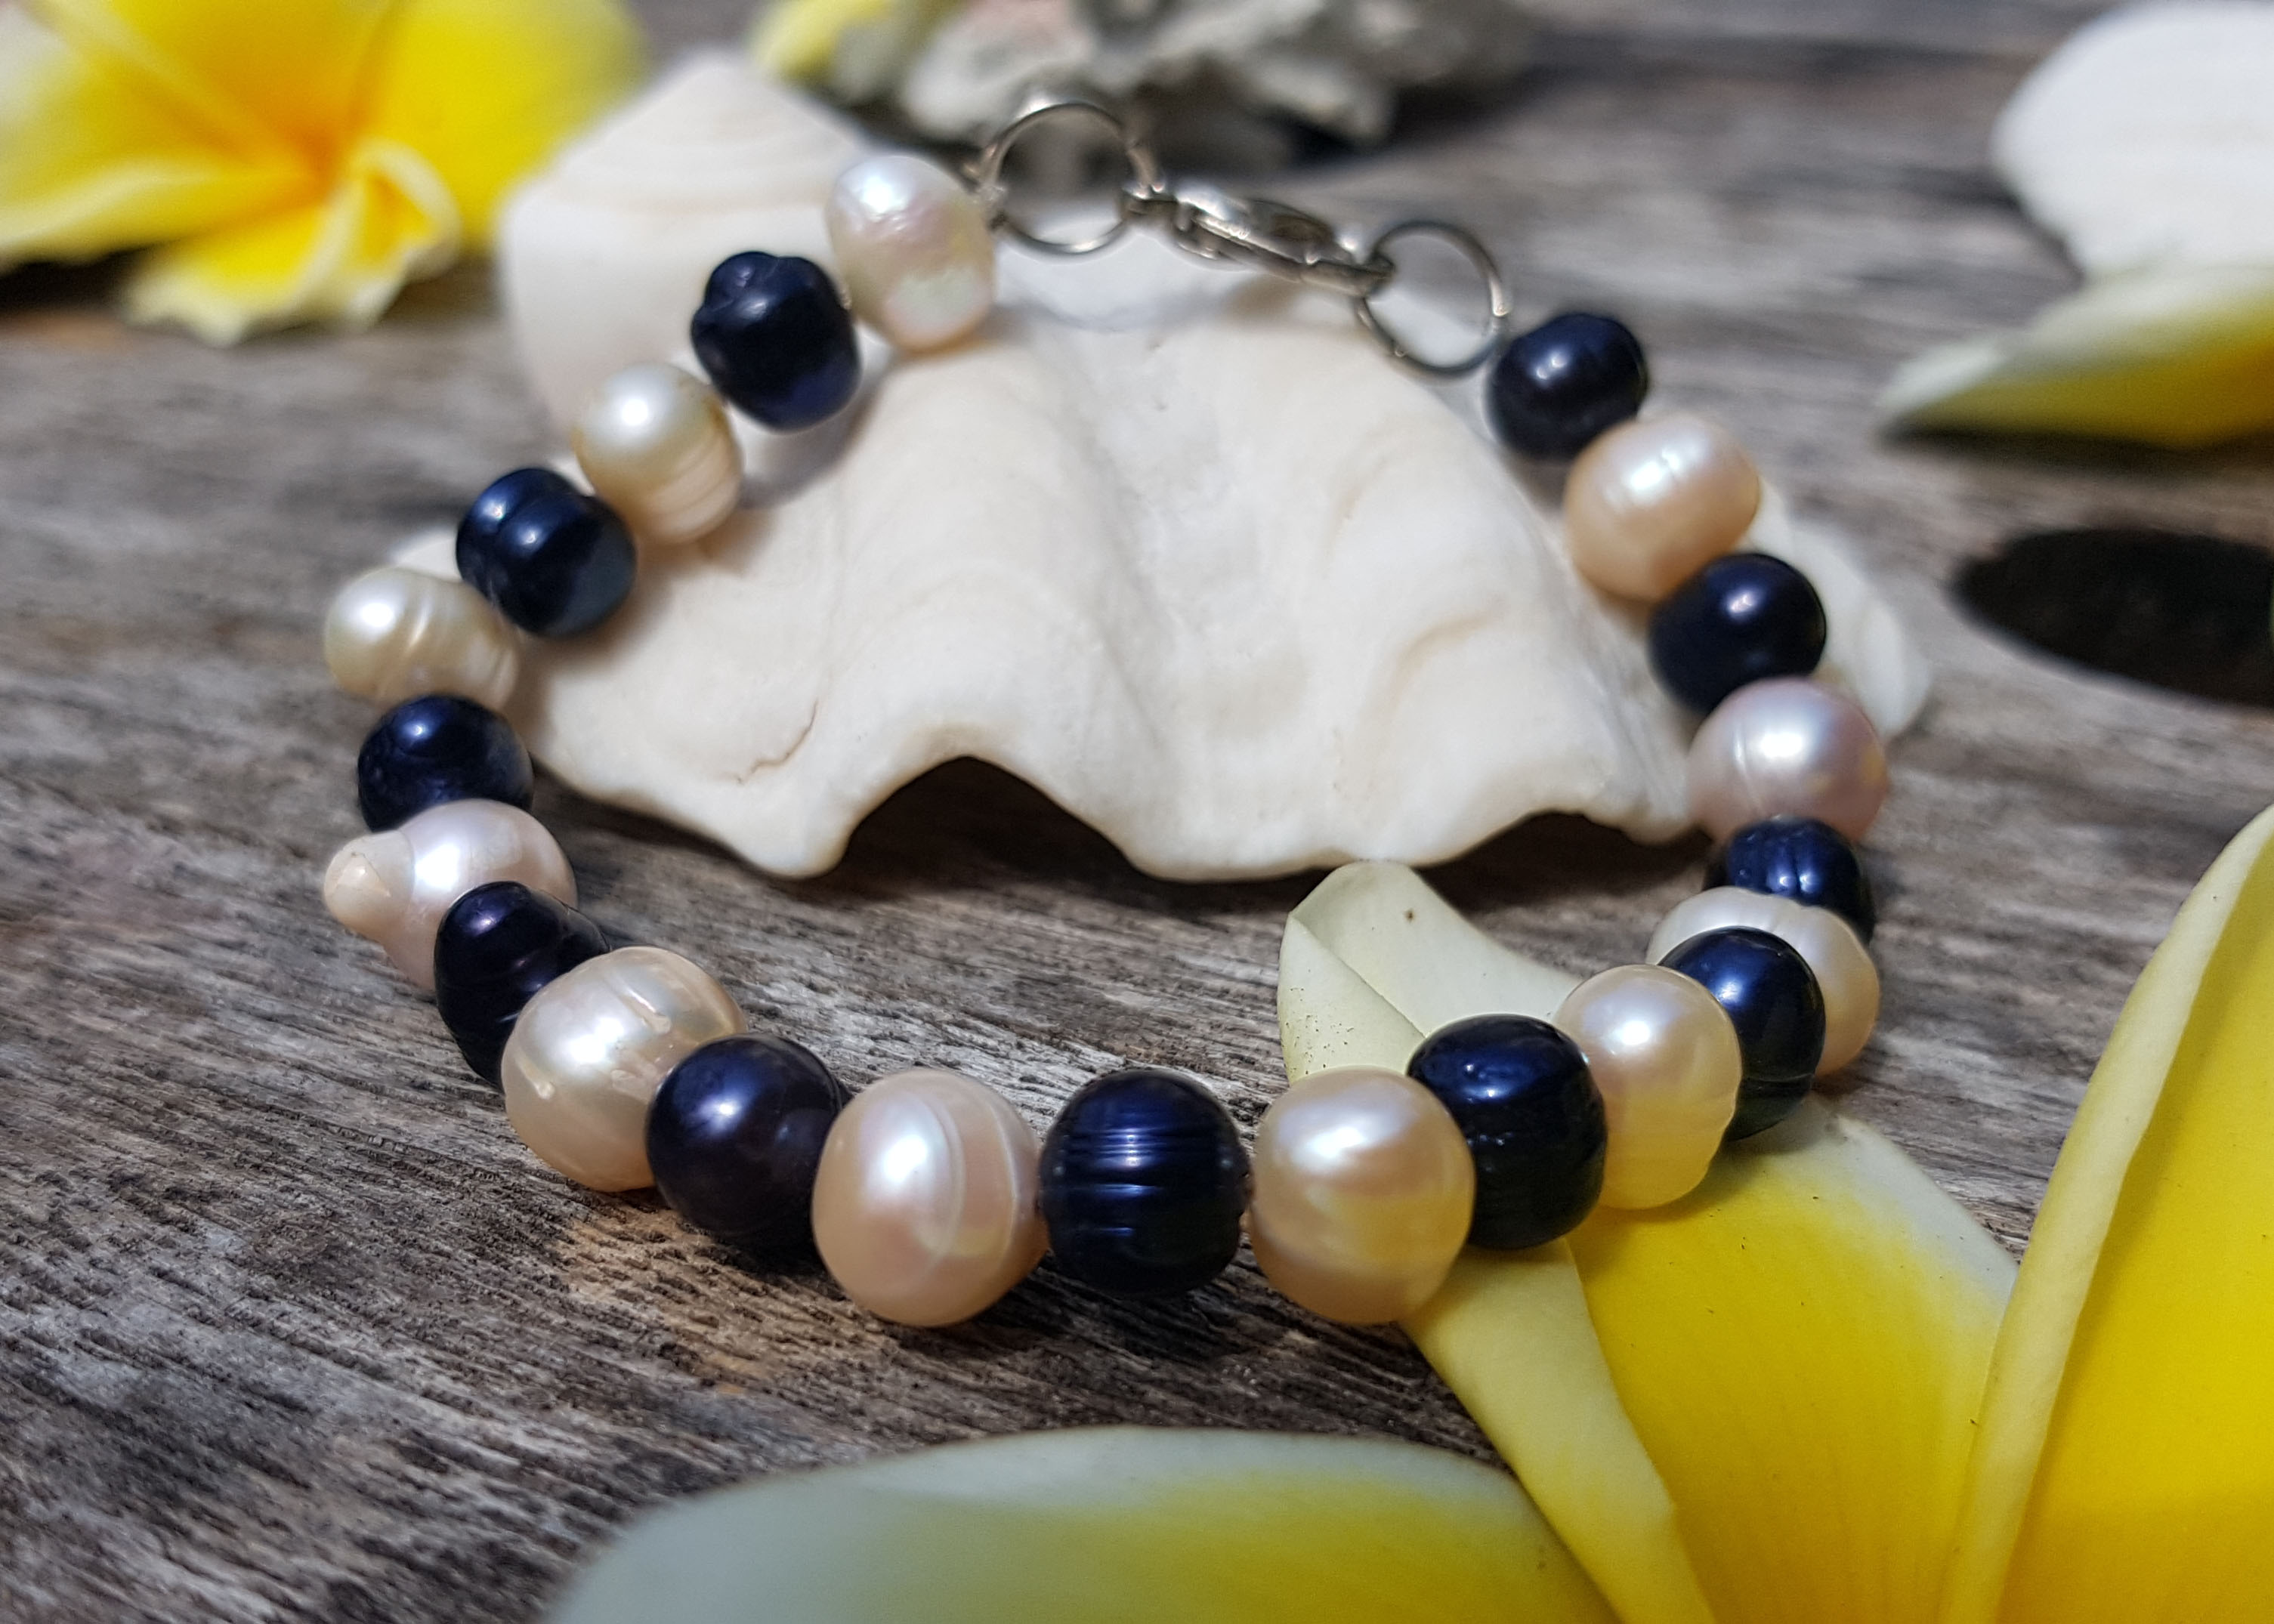 Šperky z perel